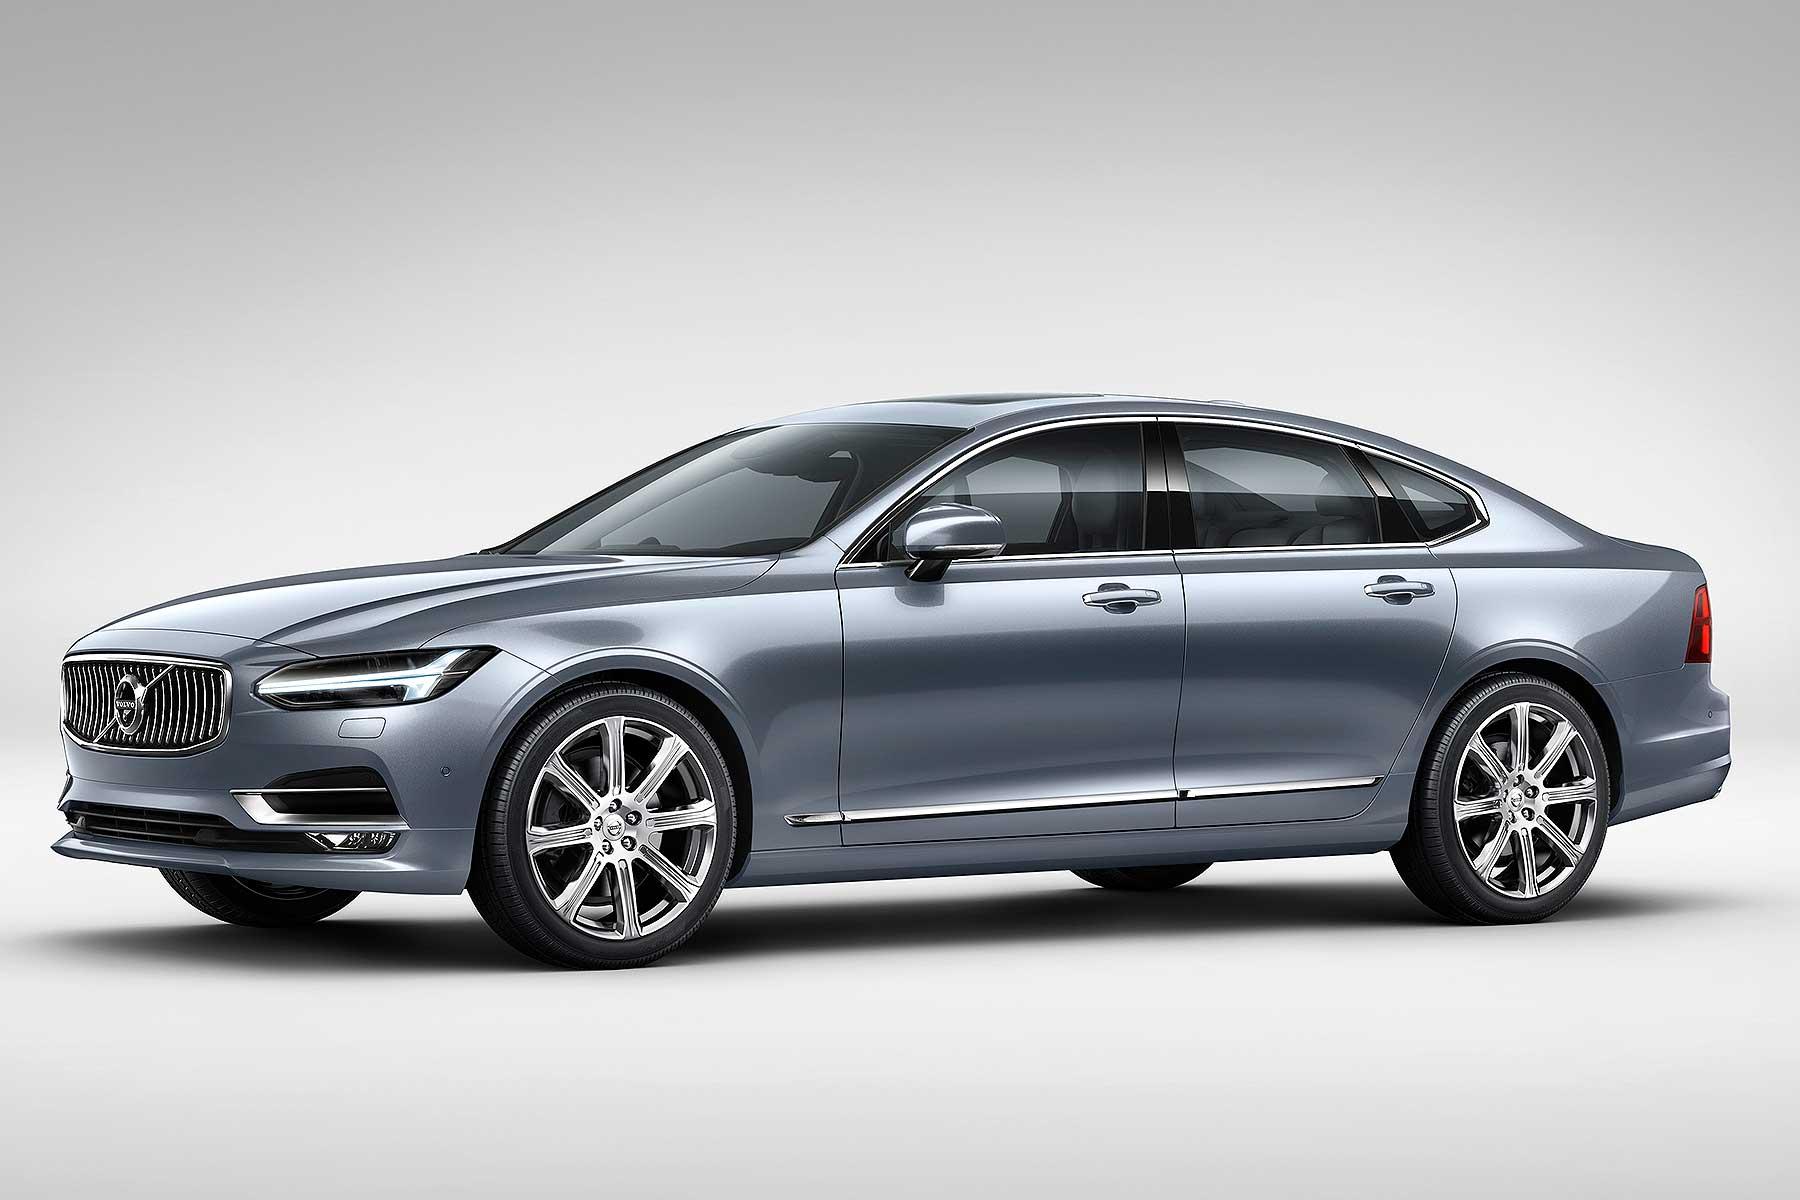 Volvo_S90_2016_front